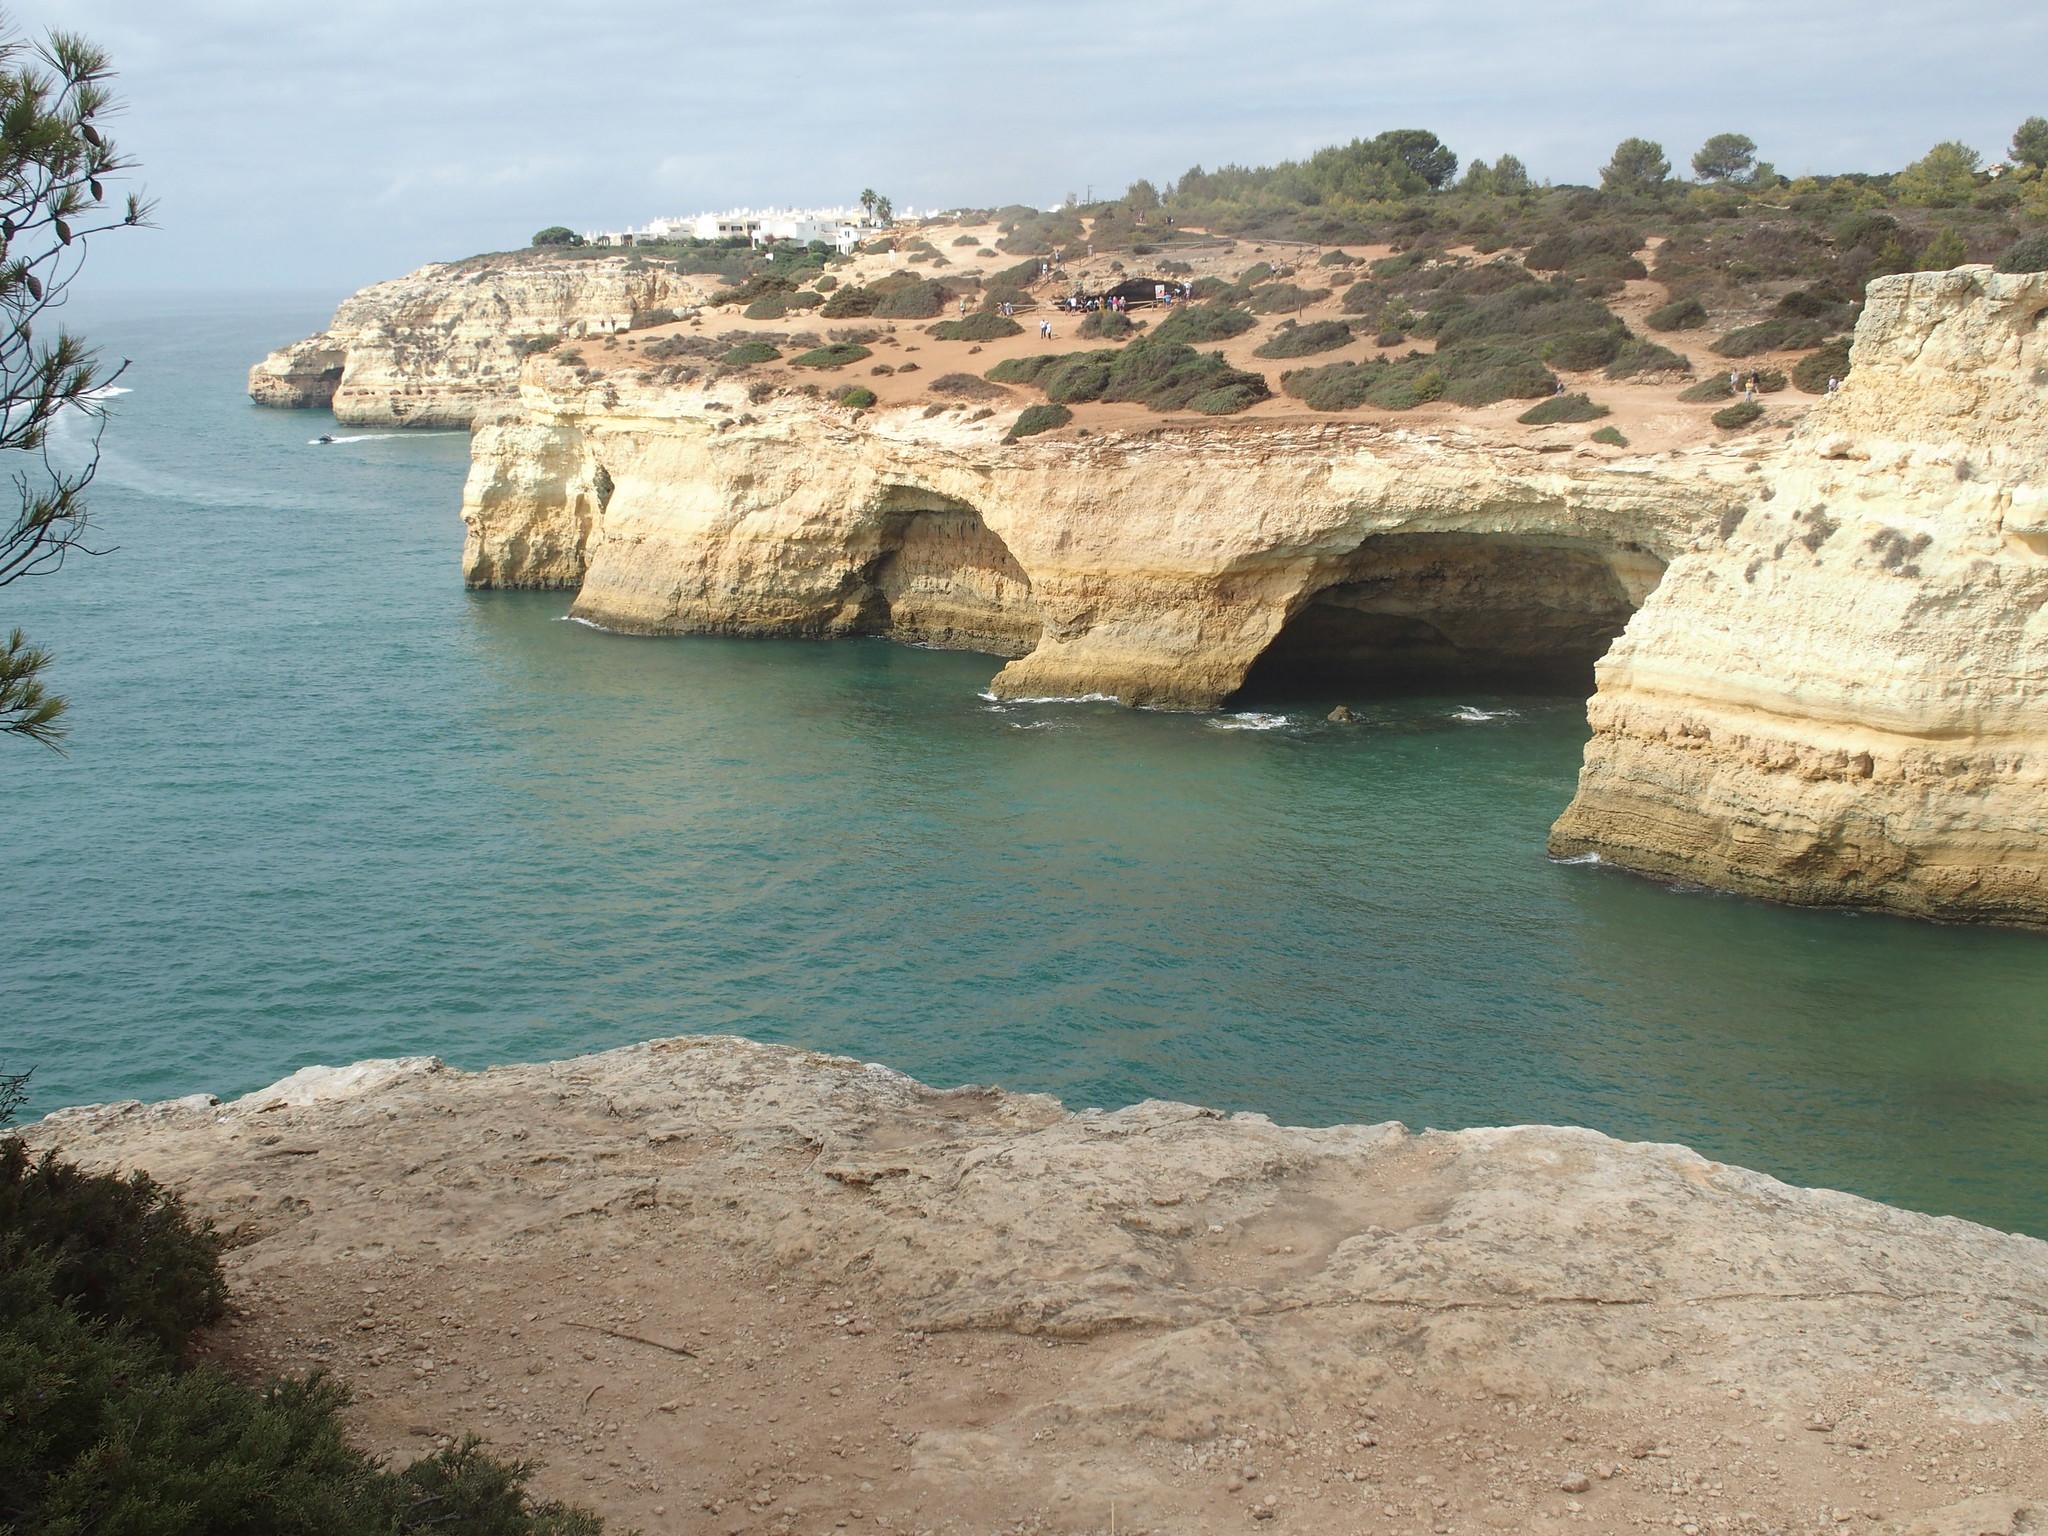 A13 Grottor